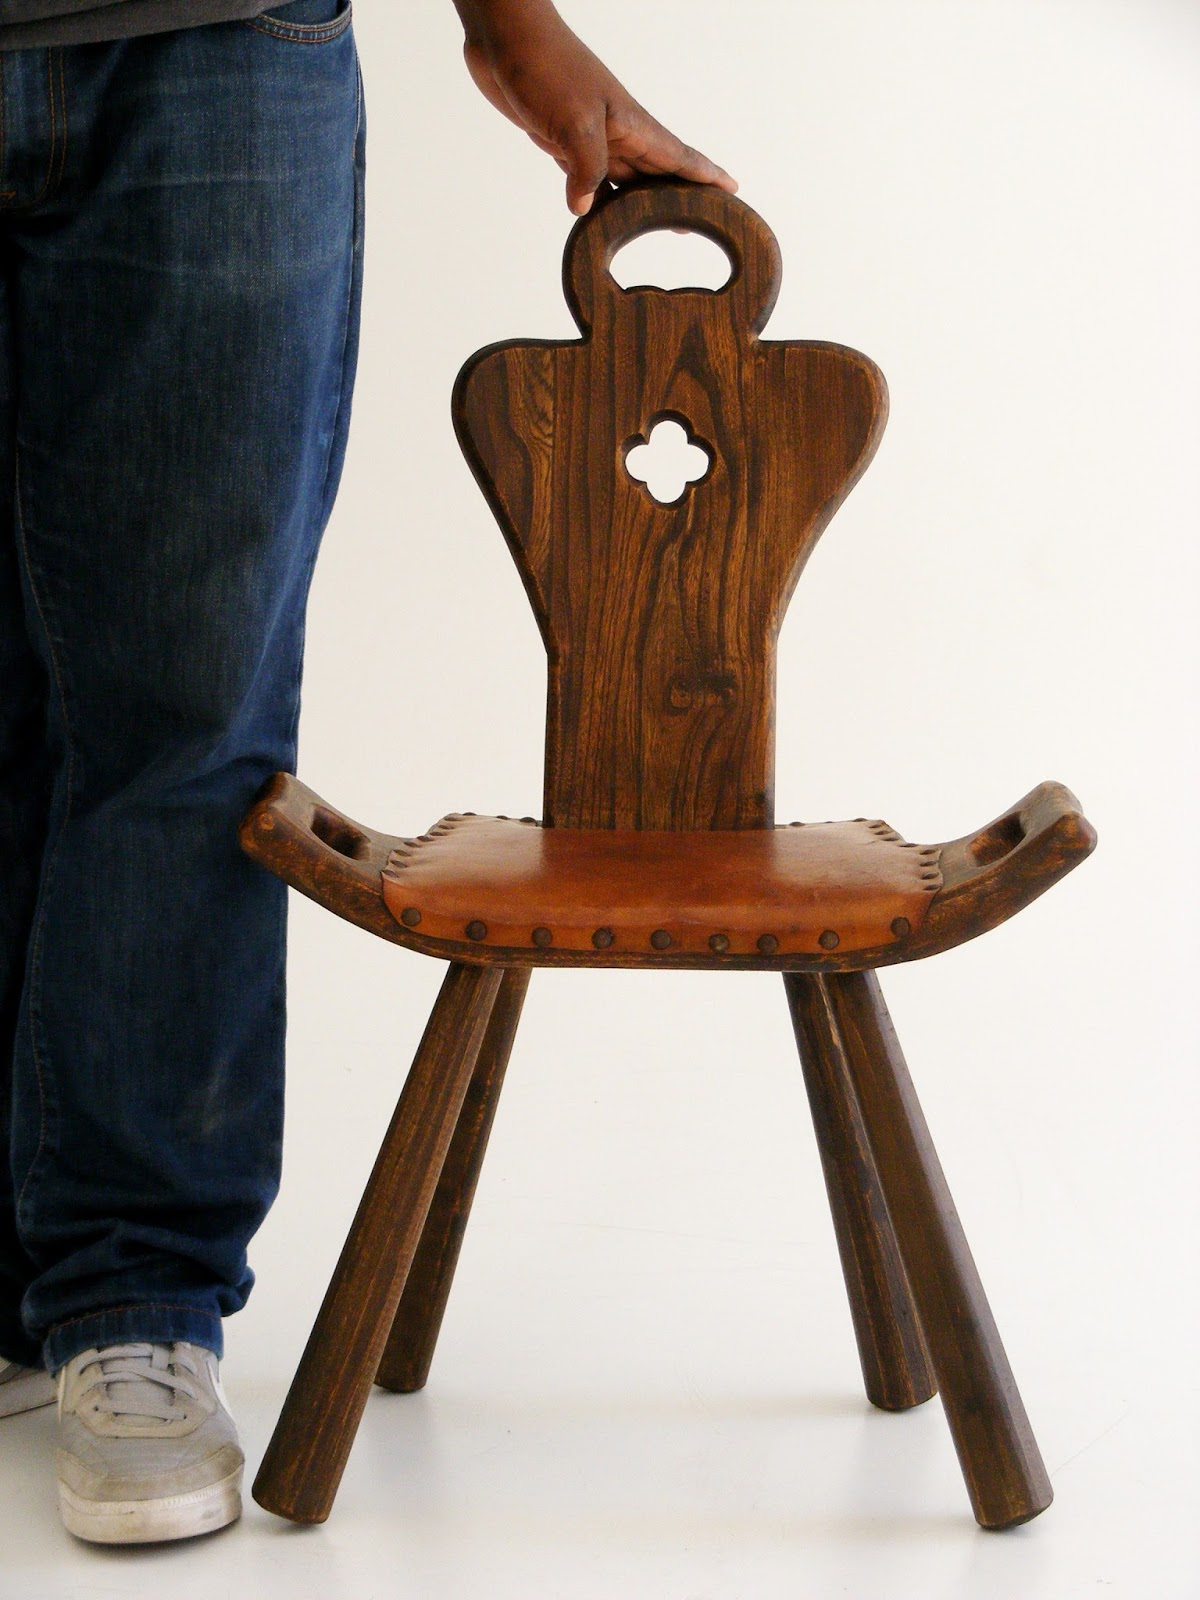 Modern birthing chair - A Pair Of Antique Spanish Birthing Chairs Height Of Seat 35cm Height Of Back 75cm Depth 32cm Width 47cm